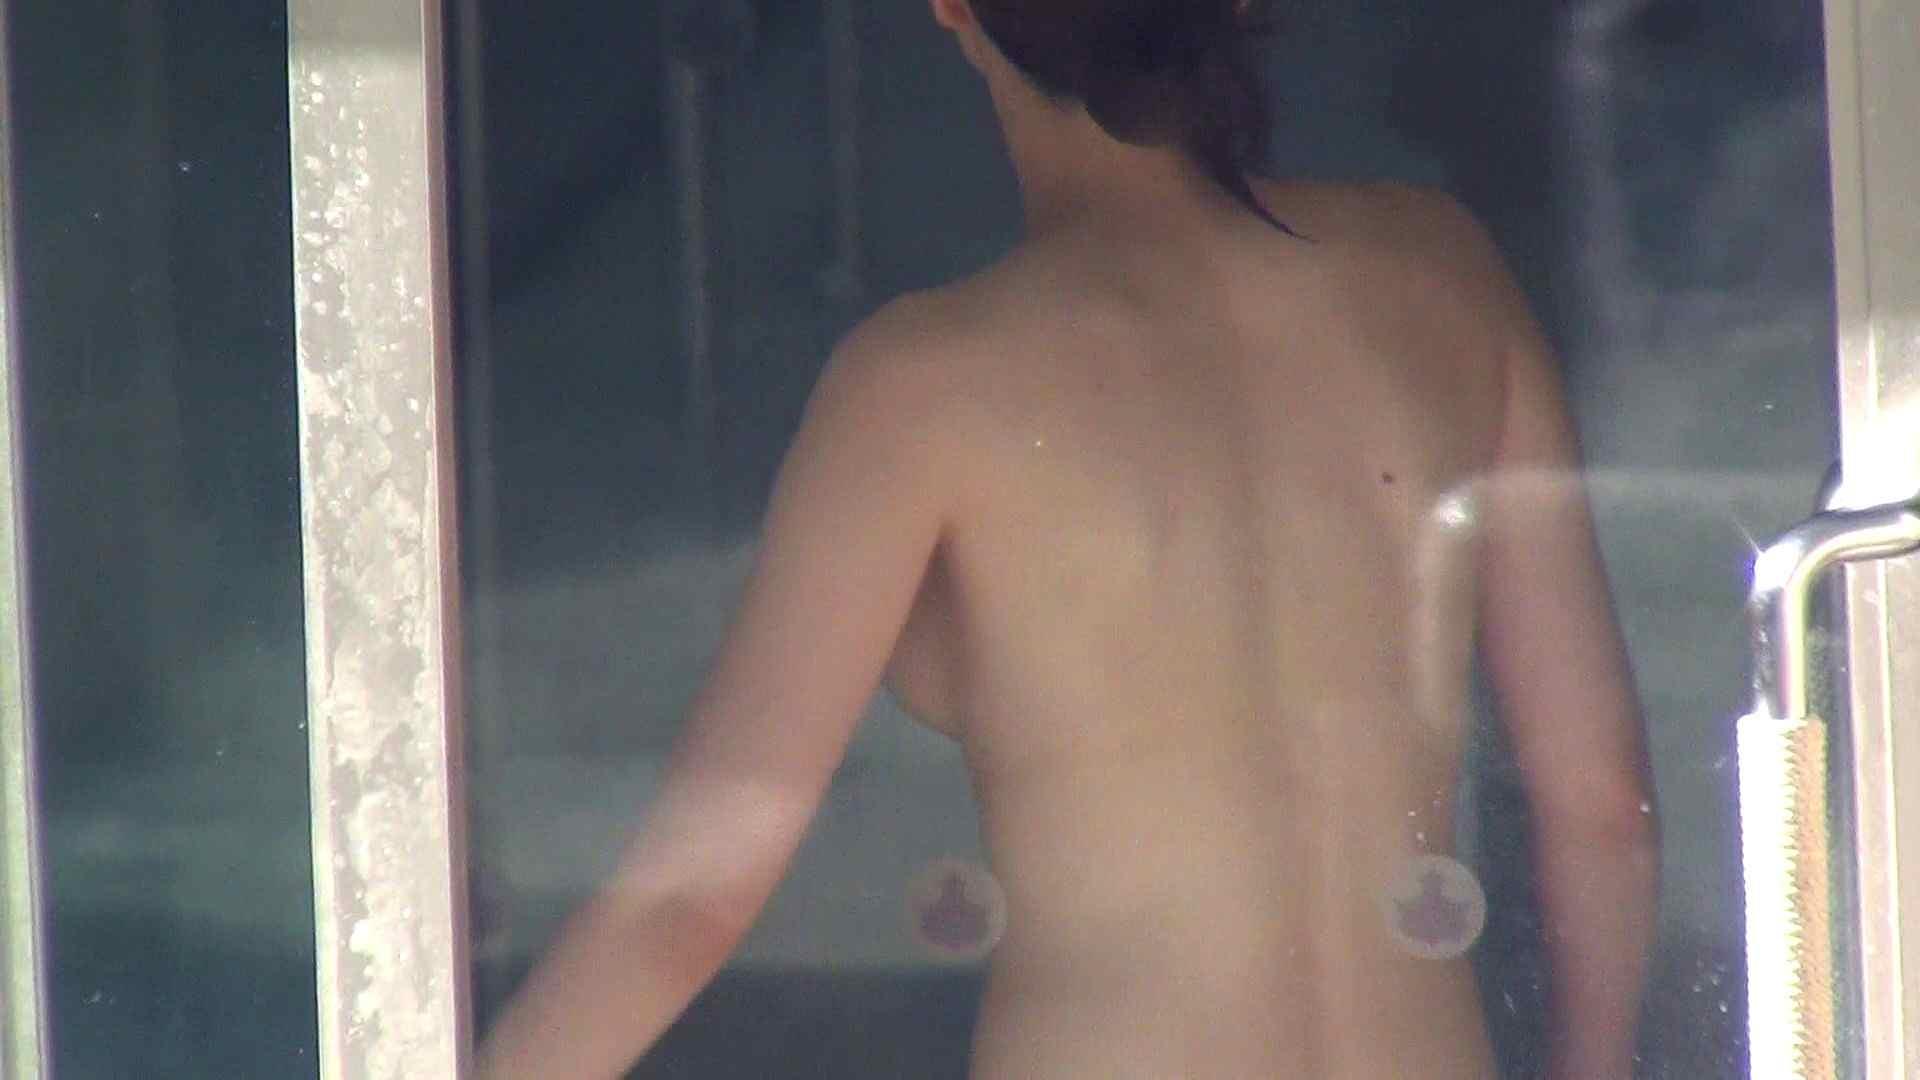 Vol.41 色形完璧な肉体を持つ奥様 露天風呂の女達 | OL  102連発 84